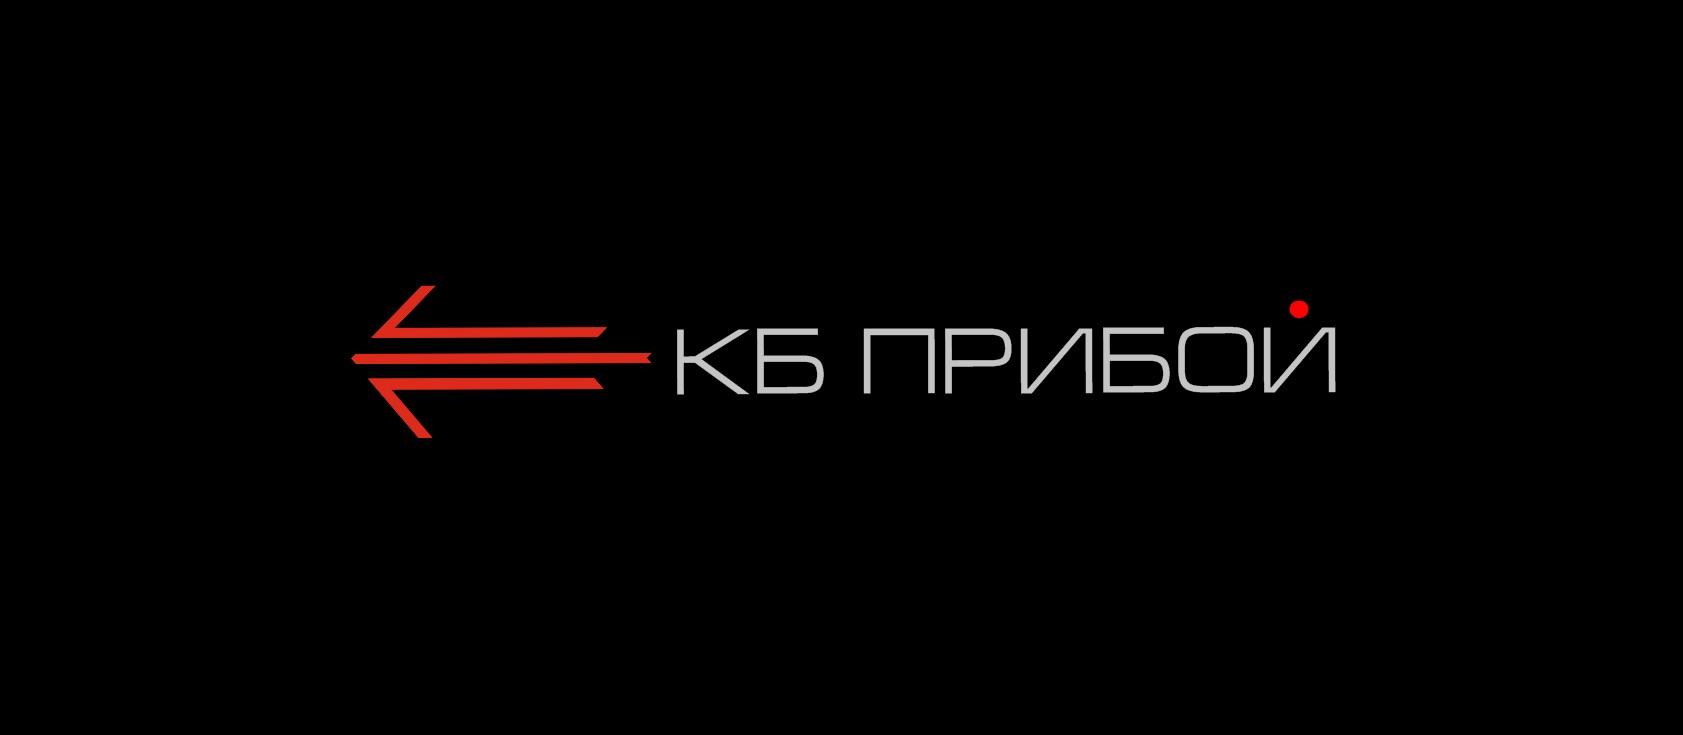 Разработка логотипа и фирменного стиля для КБ Прибой фото f_8925b236581aecb5.jpg